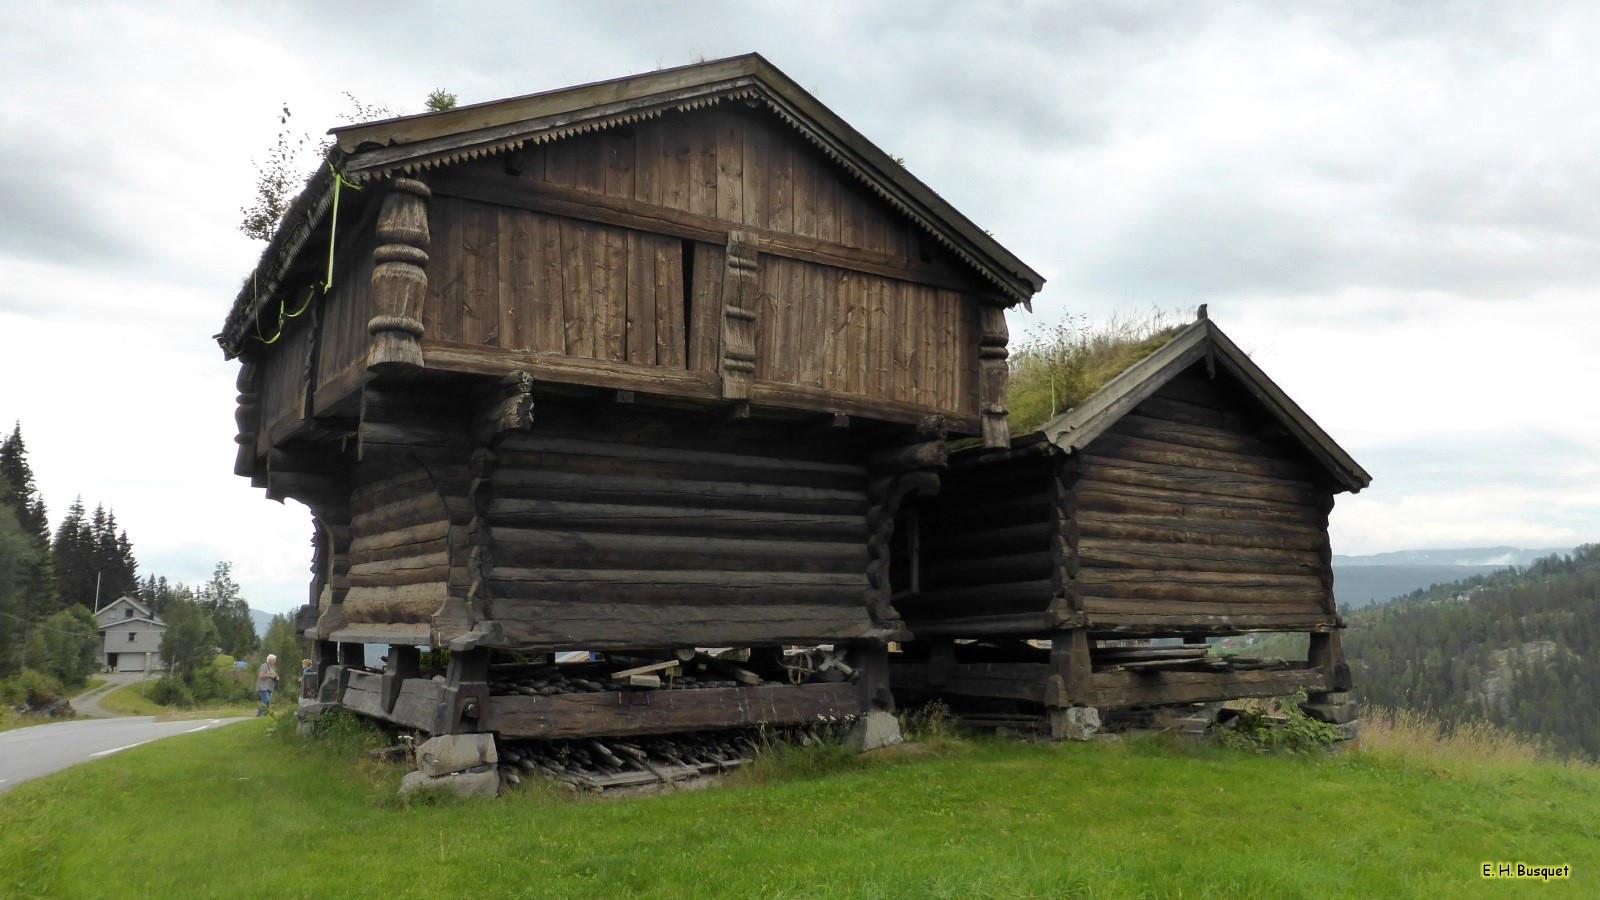 Wooden log cabins